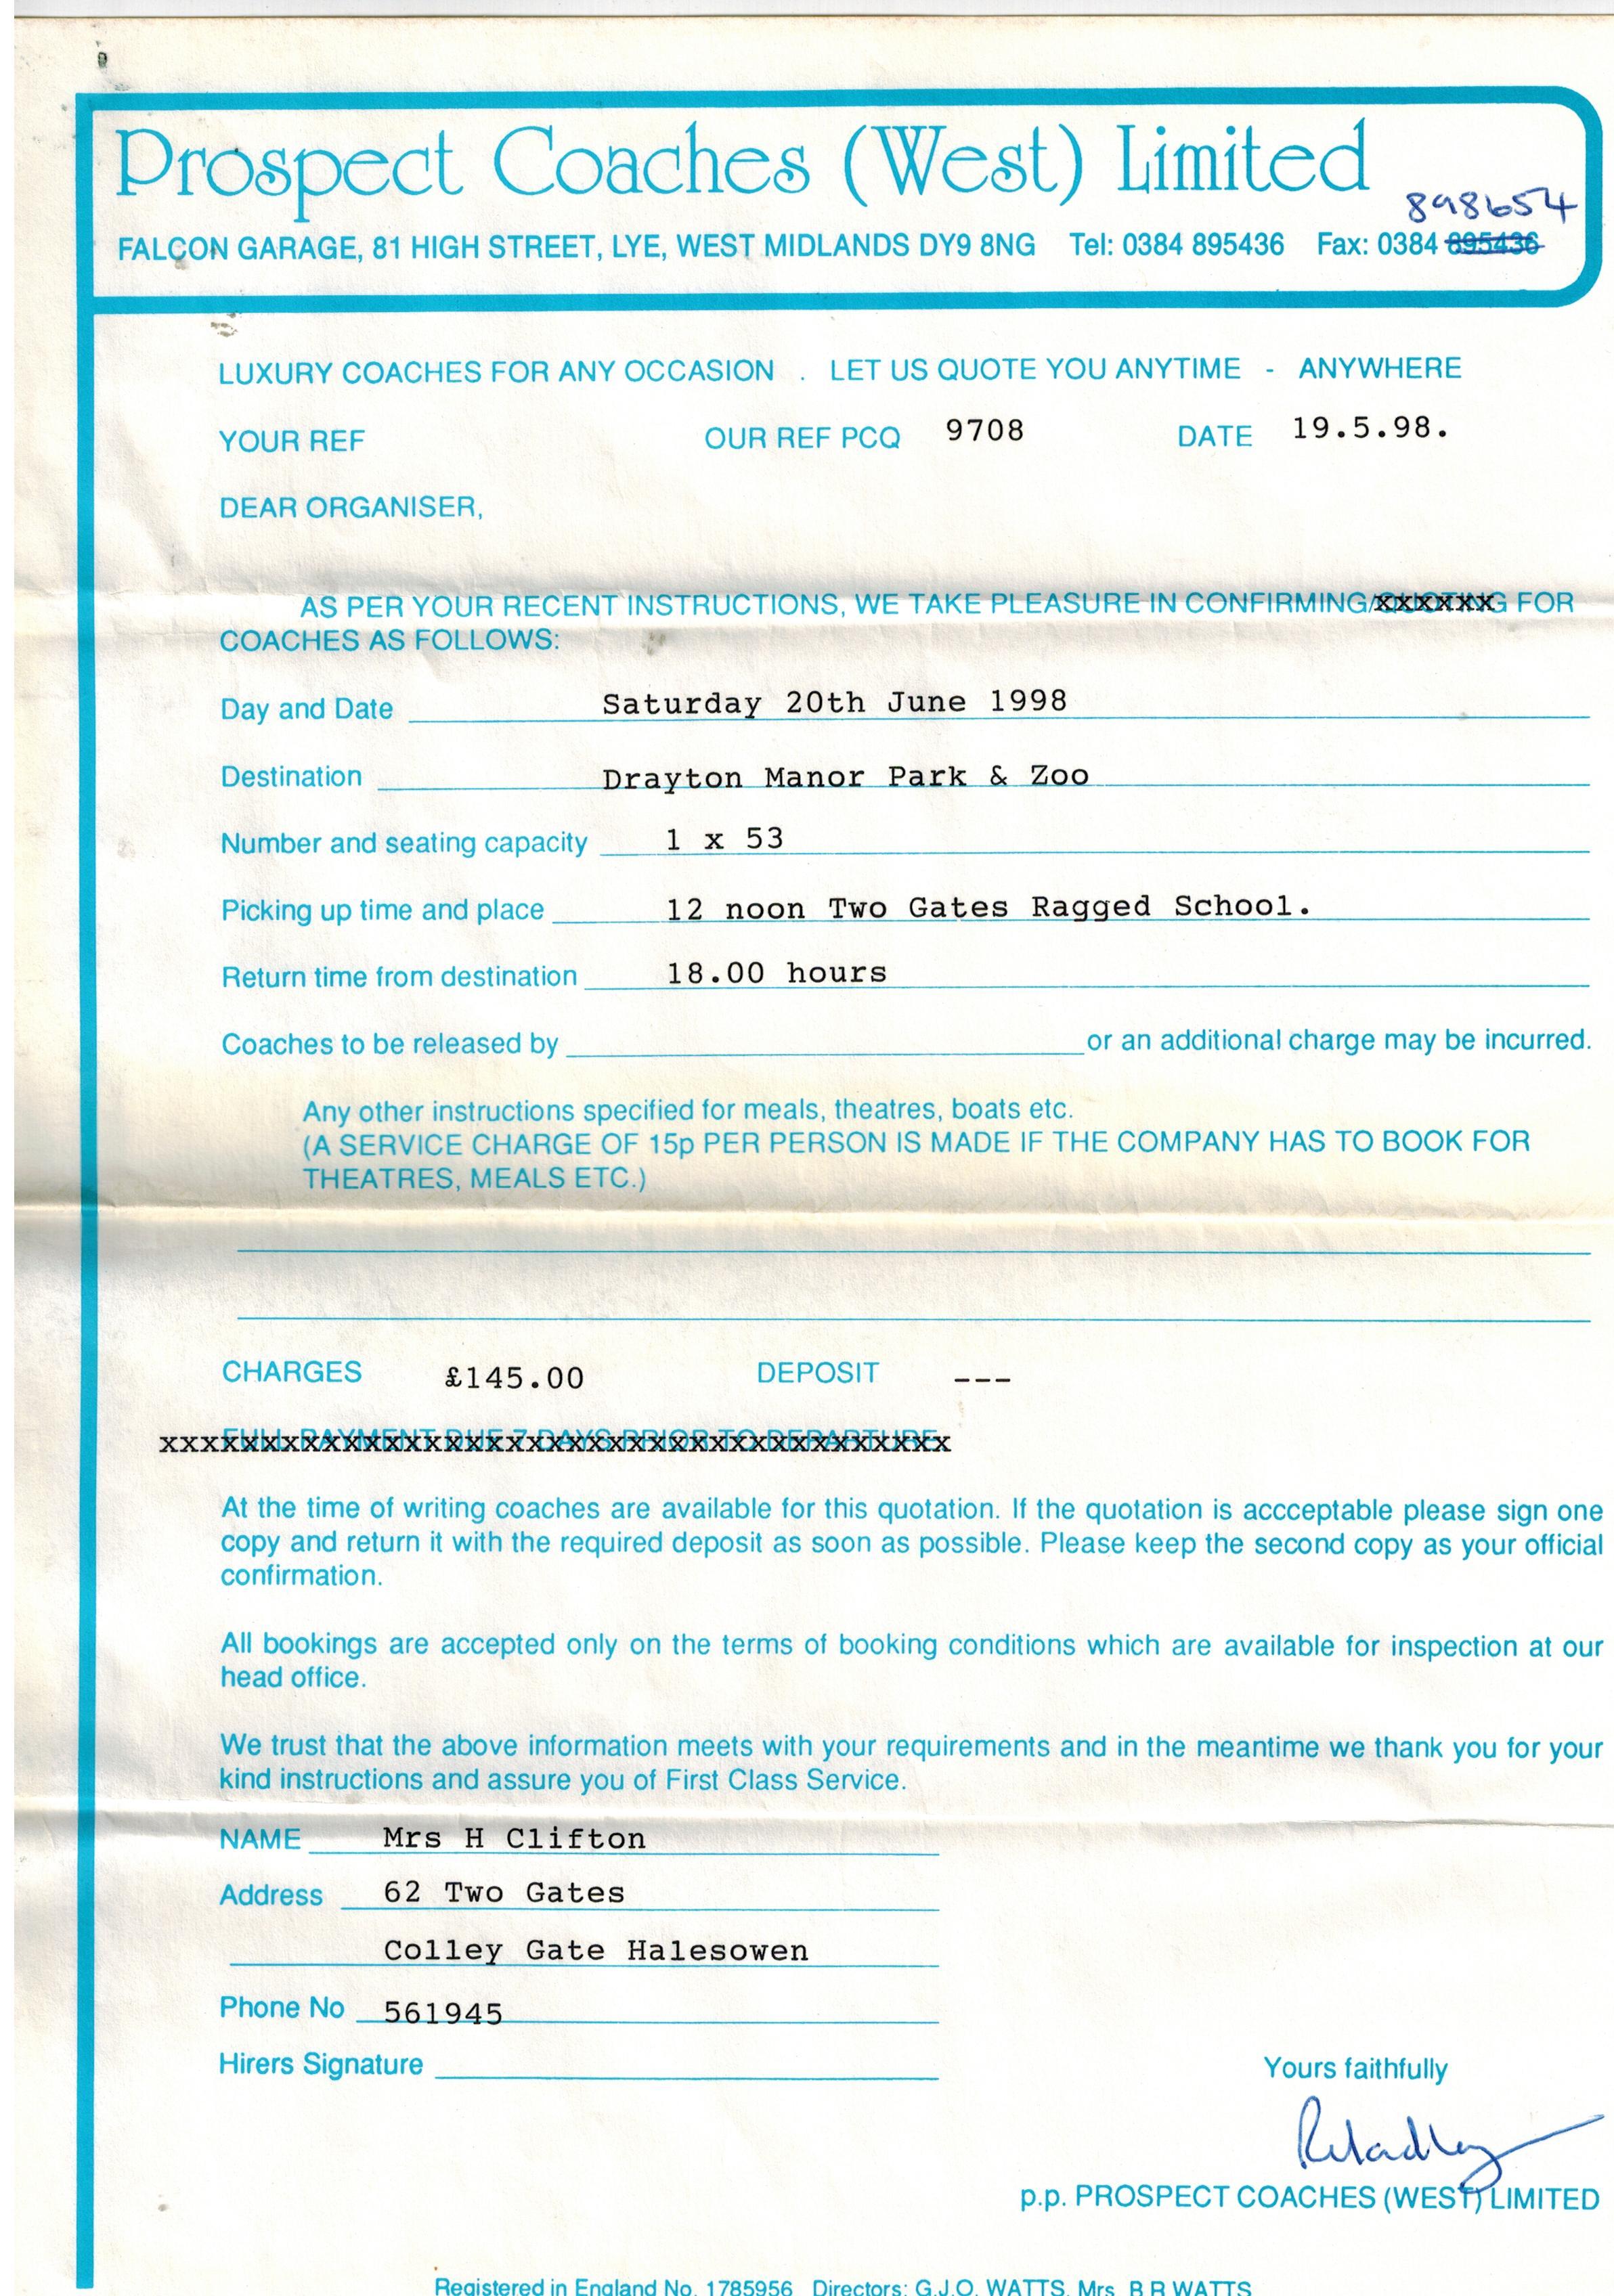 N065_Invoice_Coach_Drayton-Manor[1998]